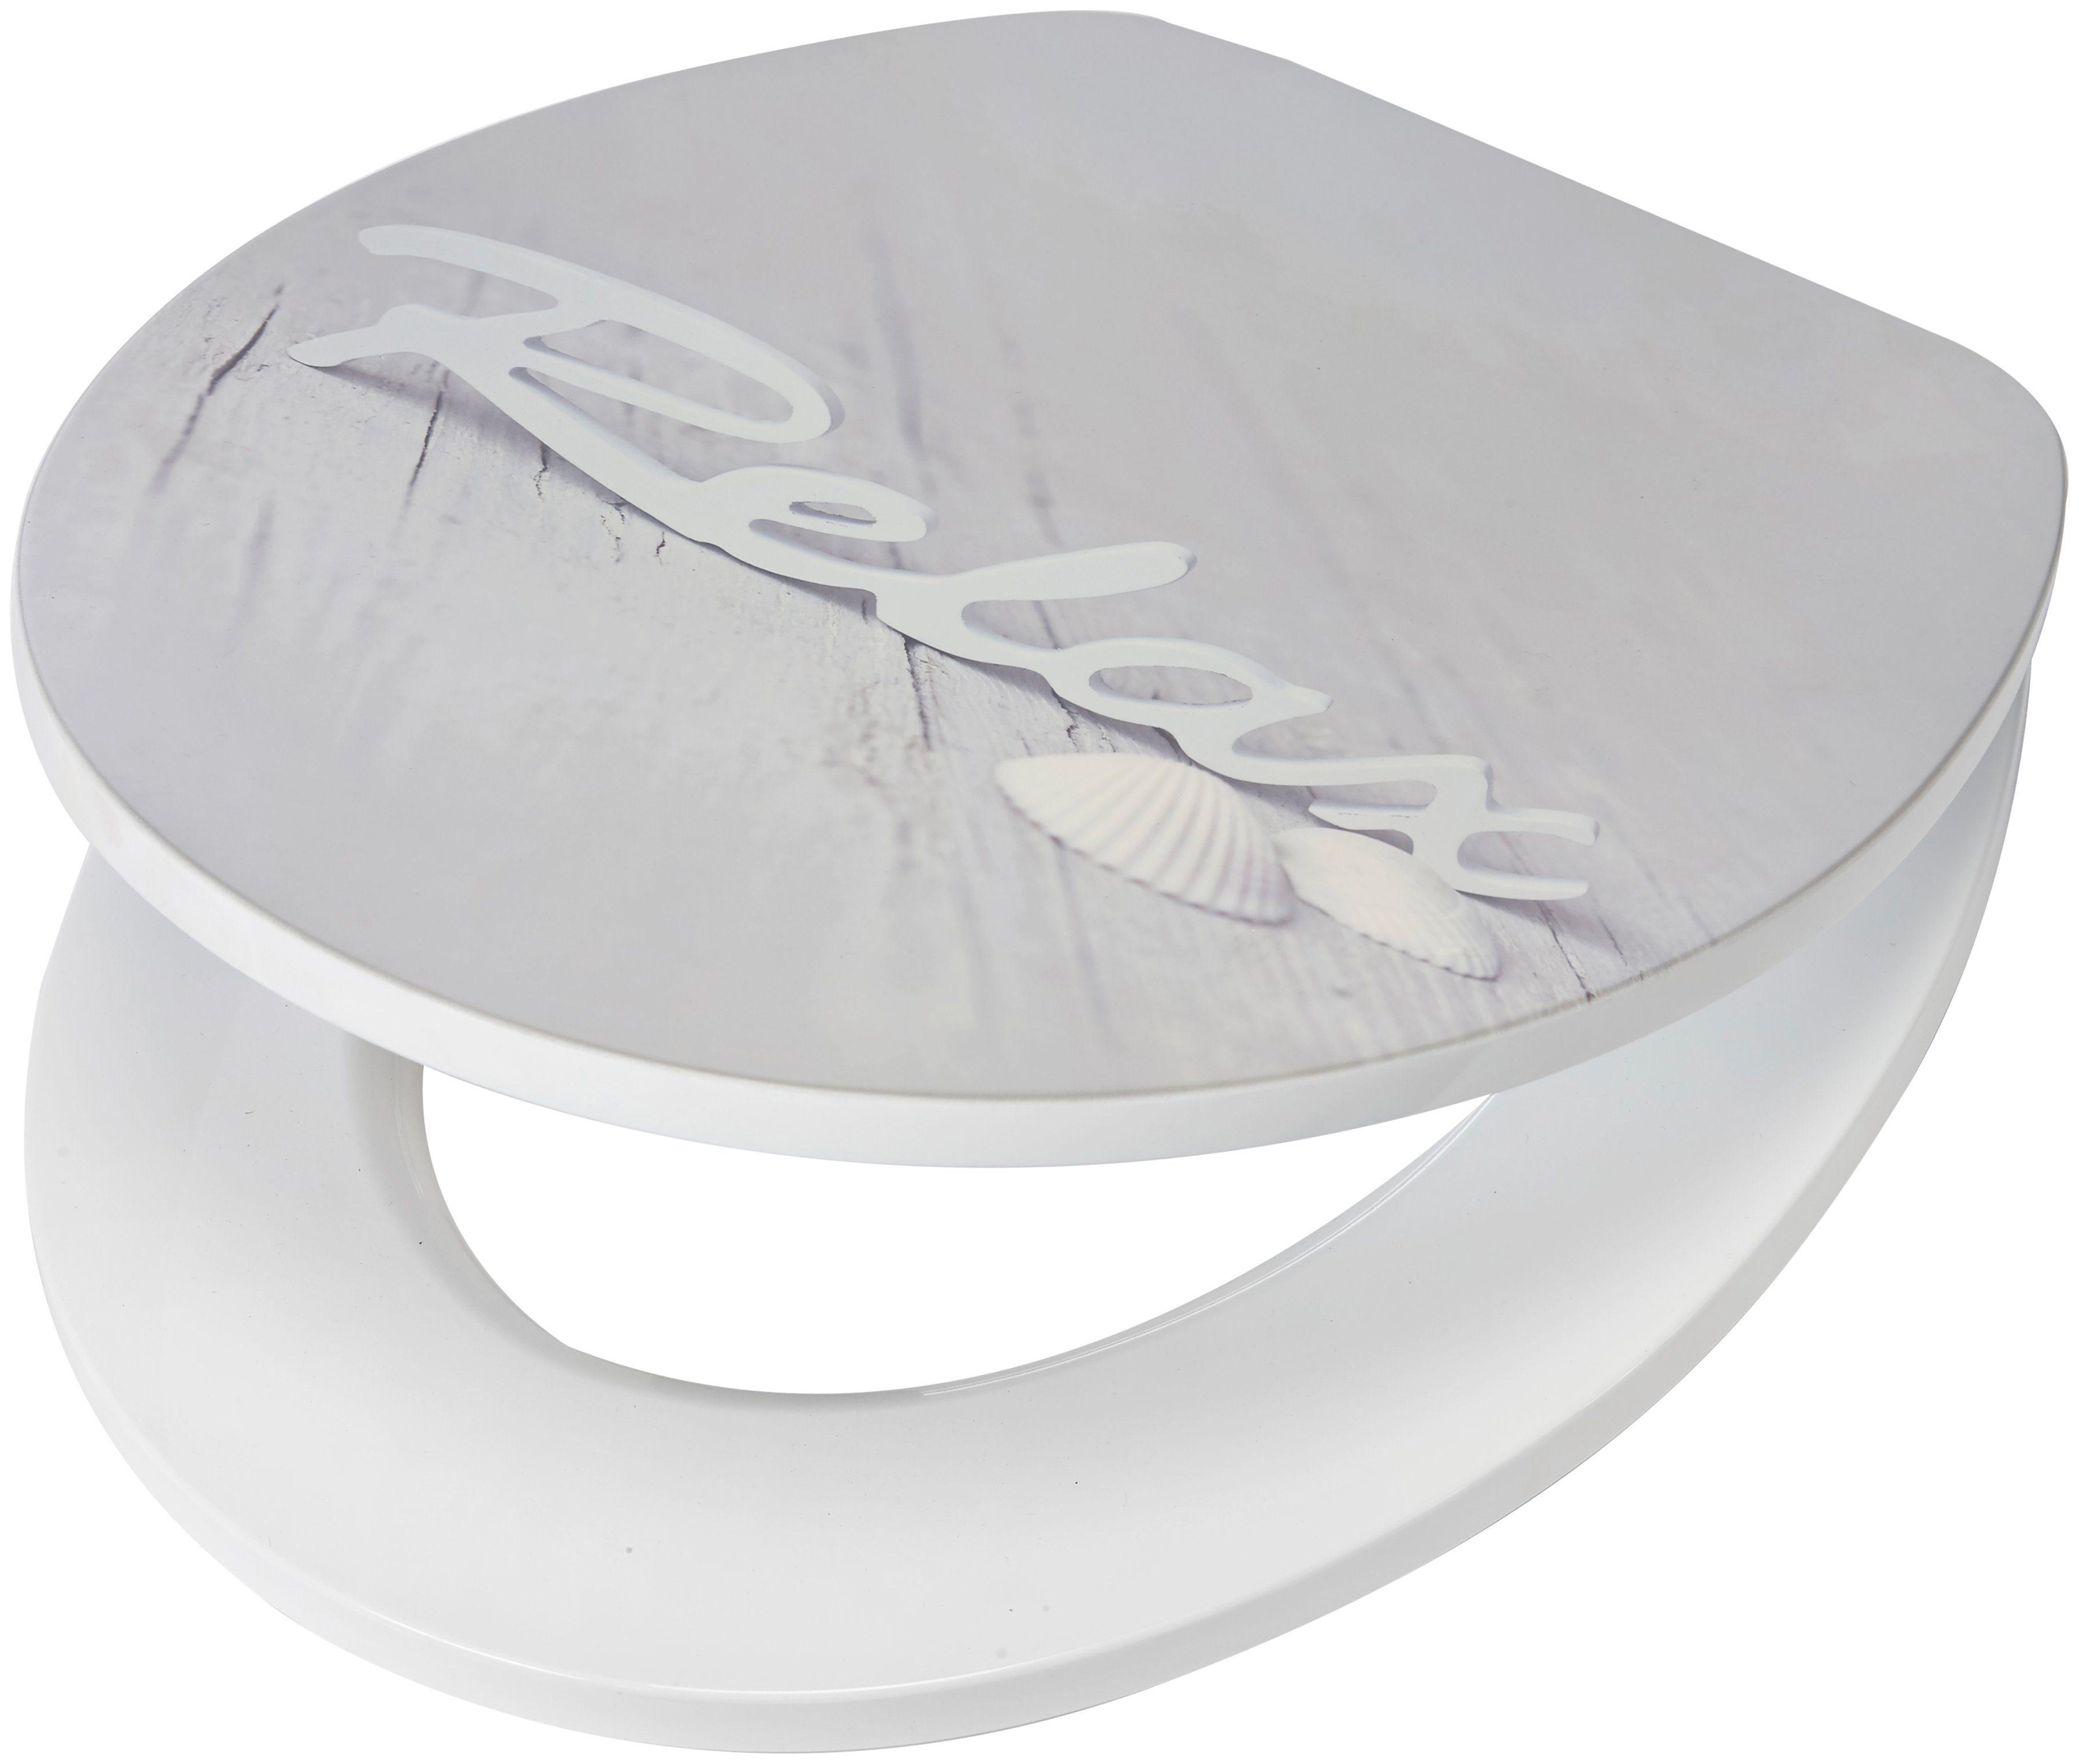 WC-Sitz »Relax«, MDF Toilettensitz mit Absenkautomatik